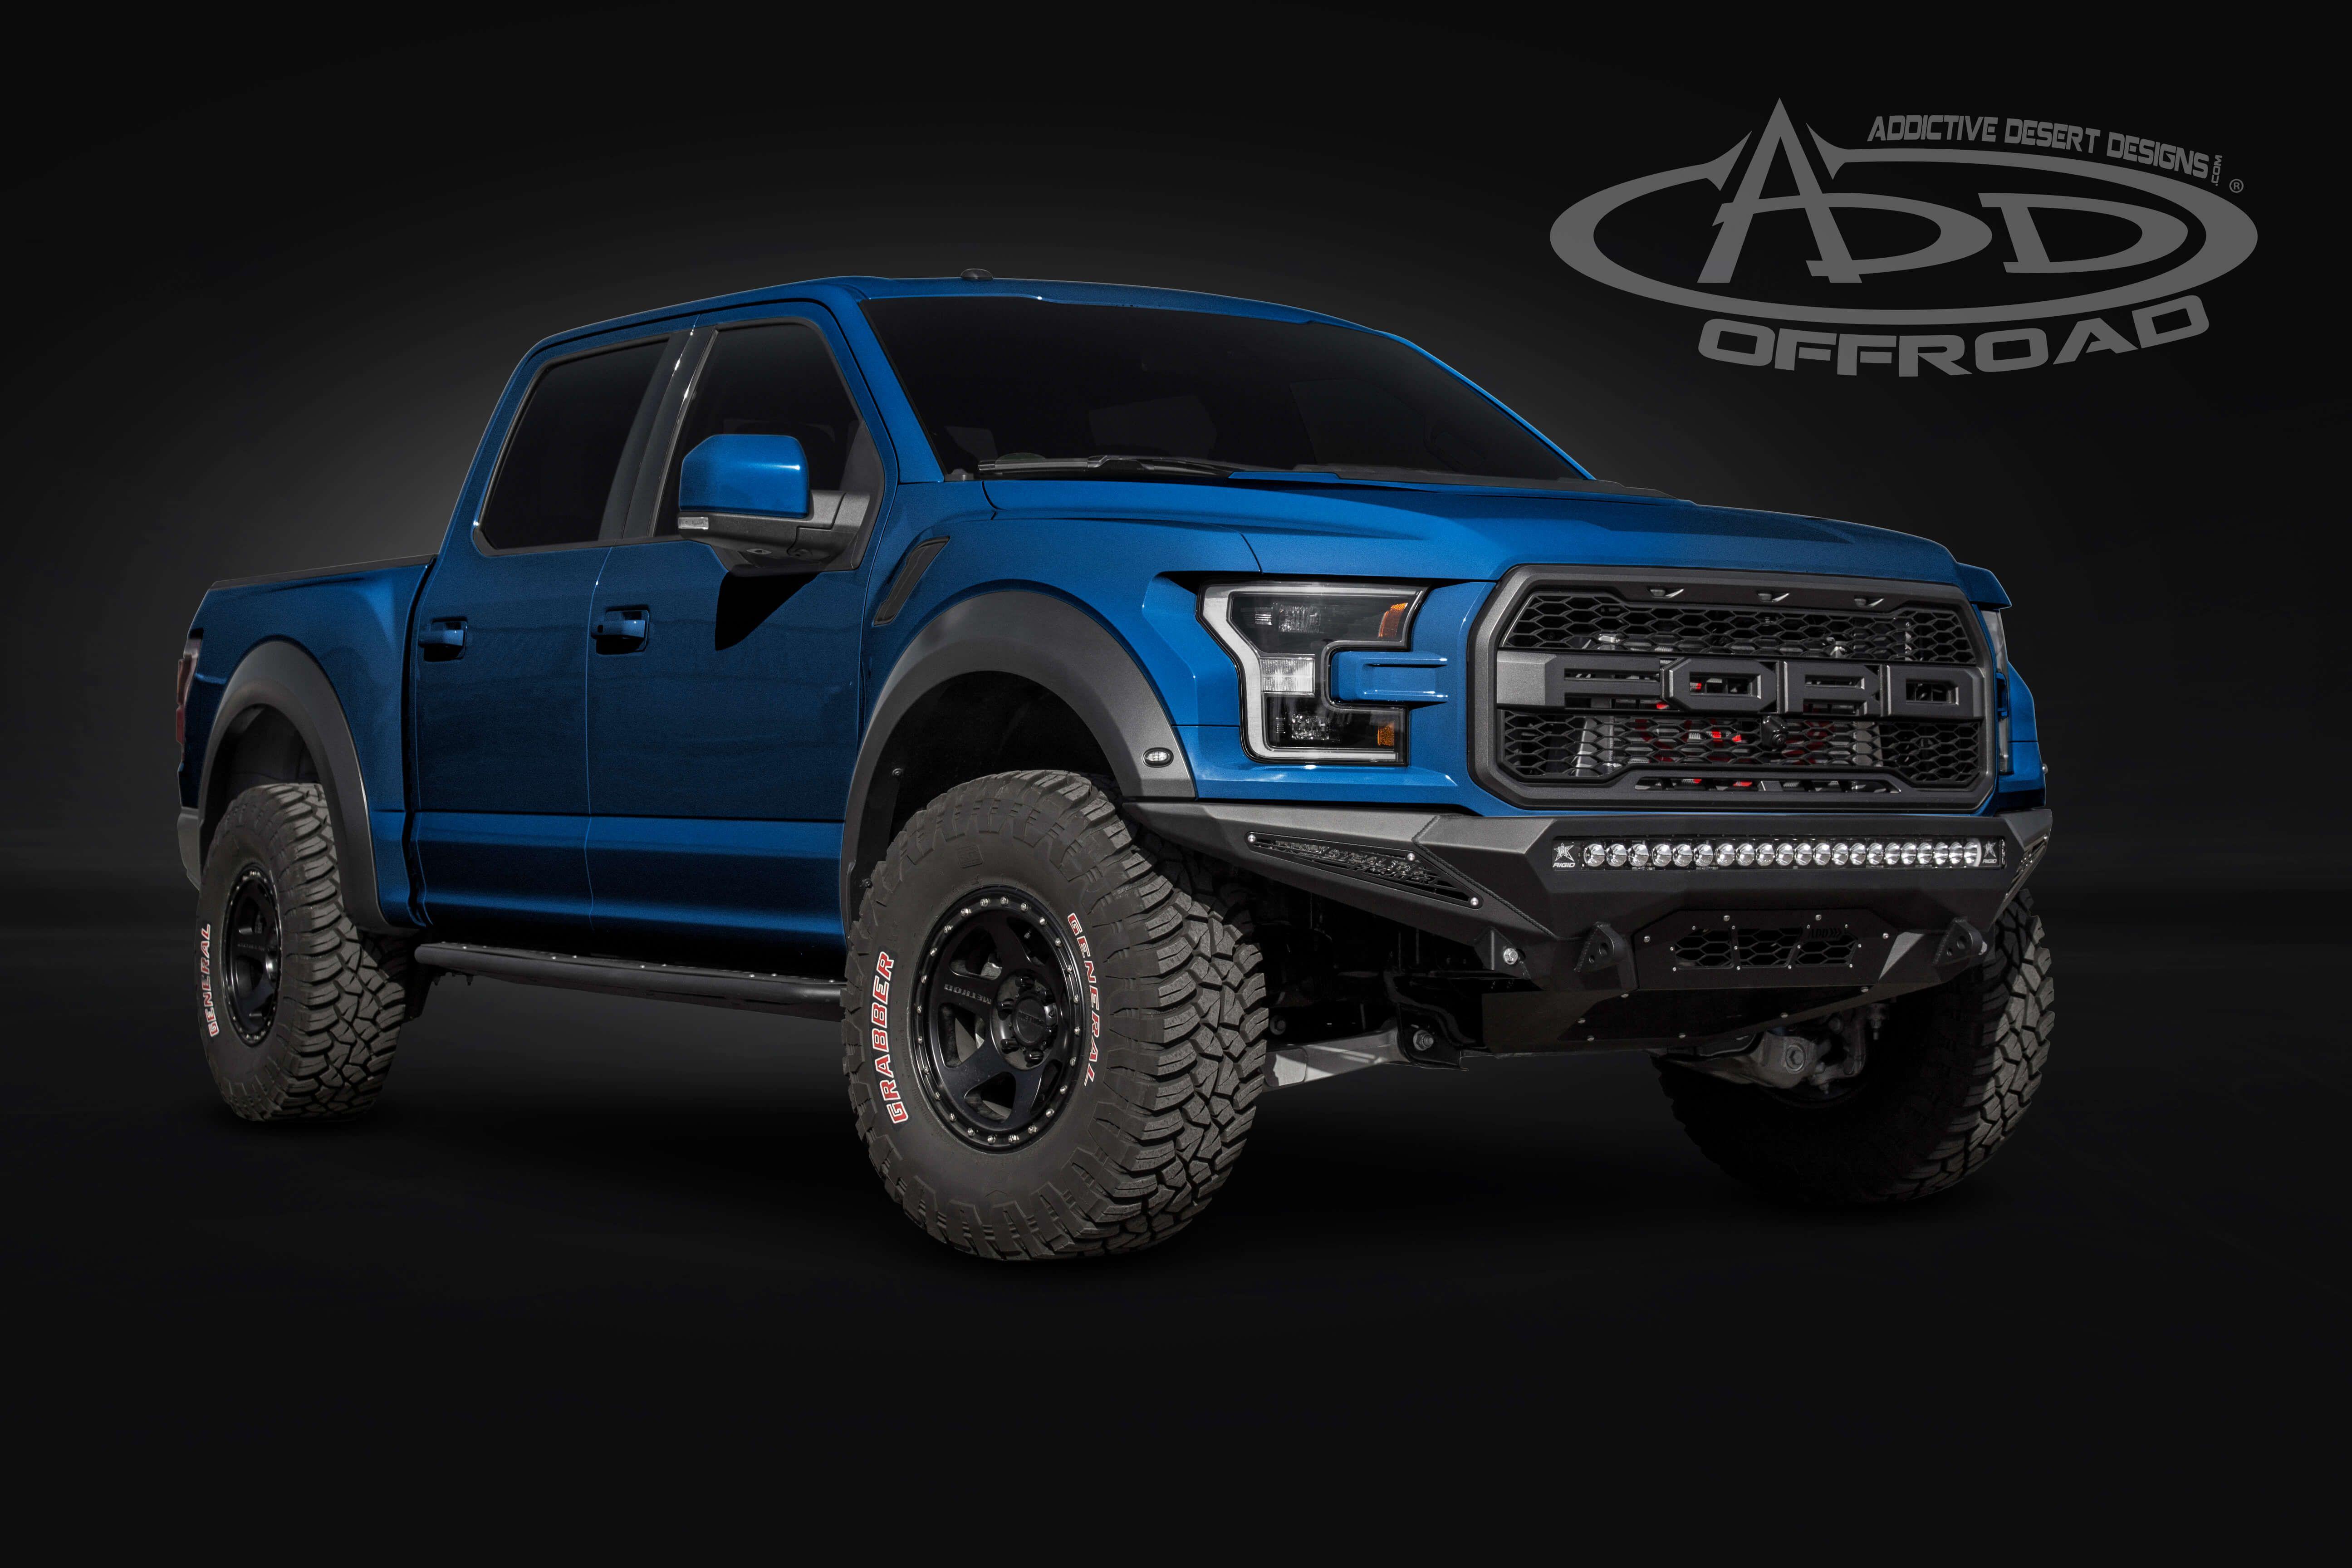 44+ Ford performance blue raptor ideas in 2021